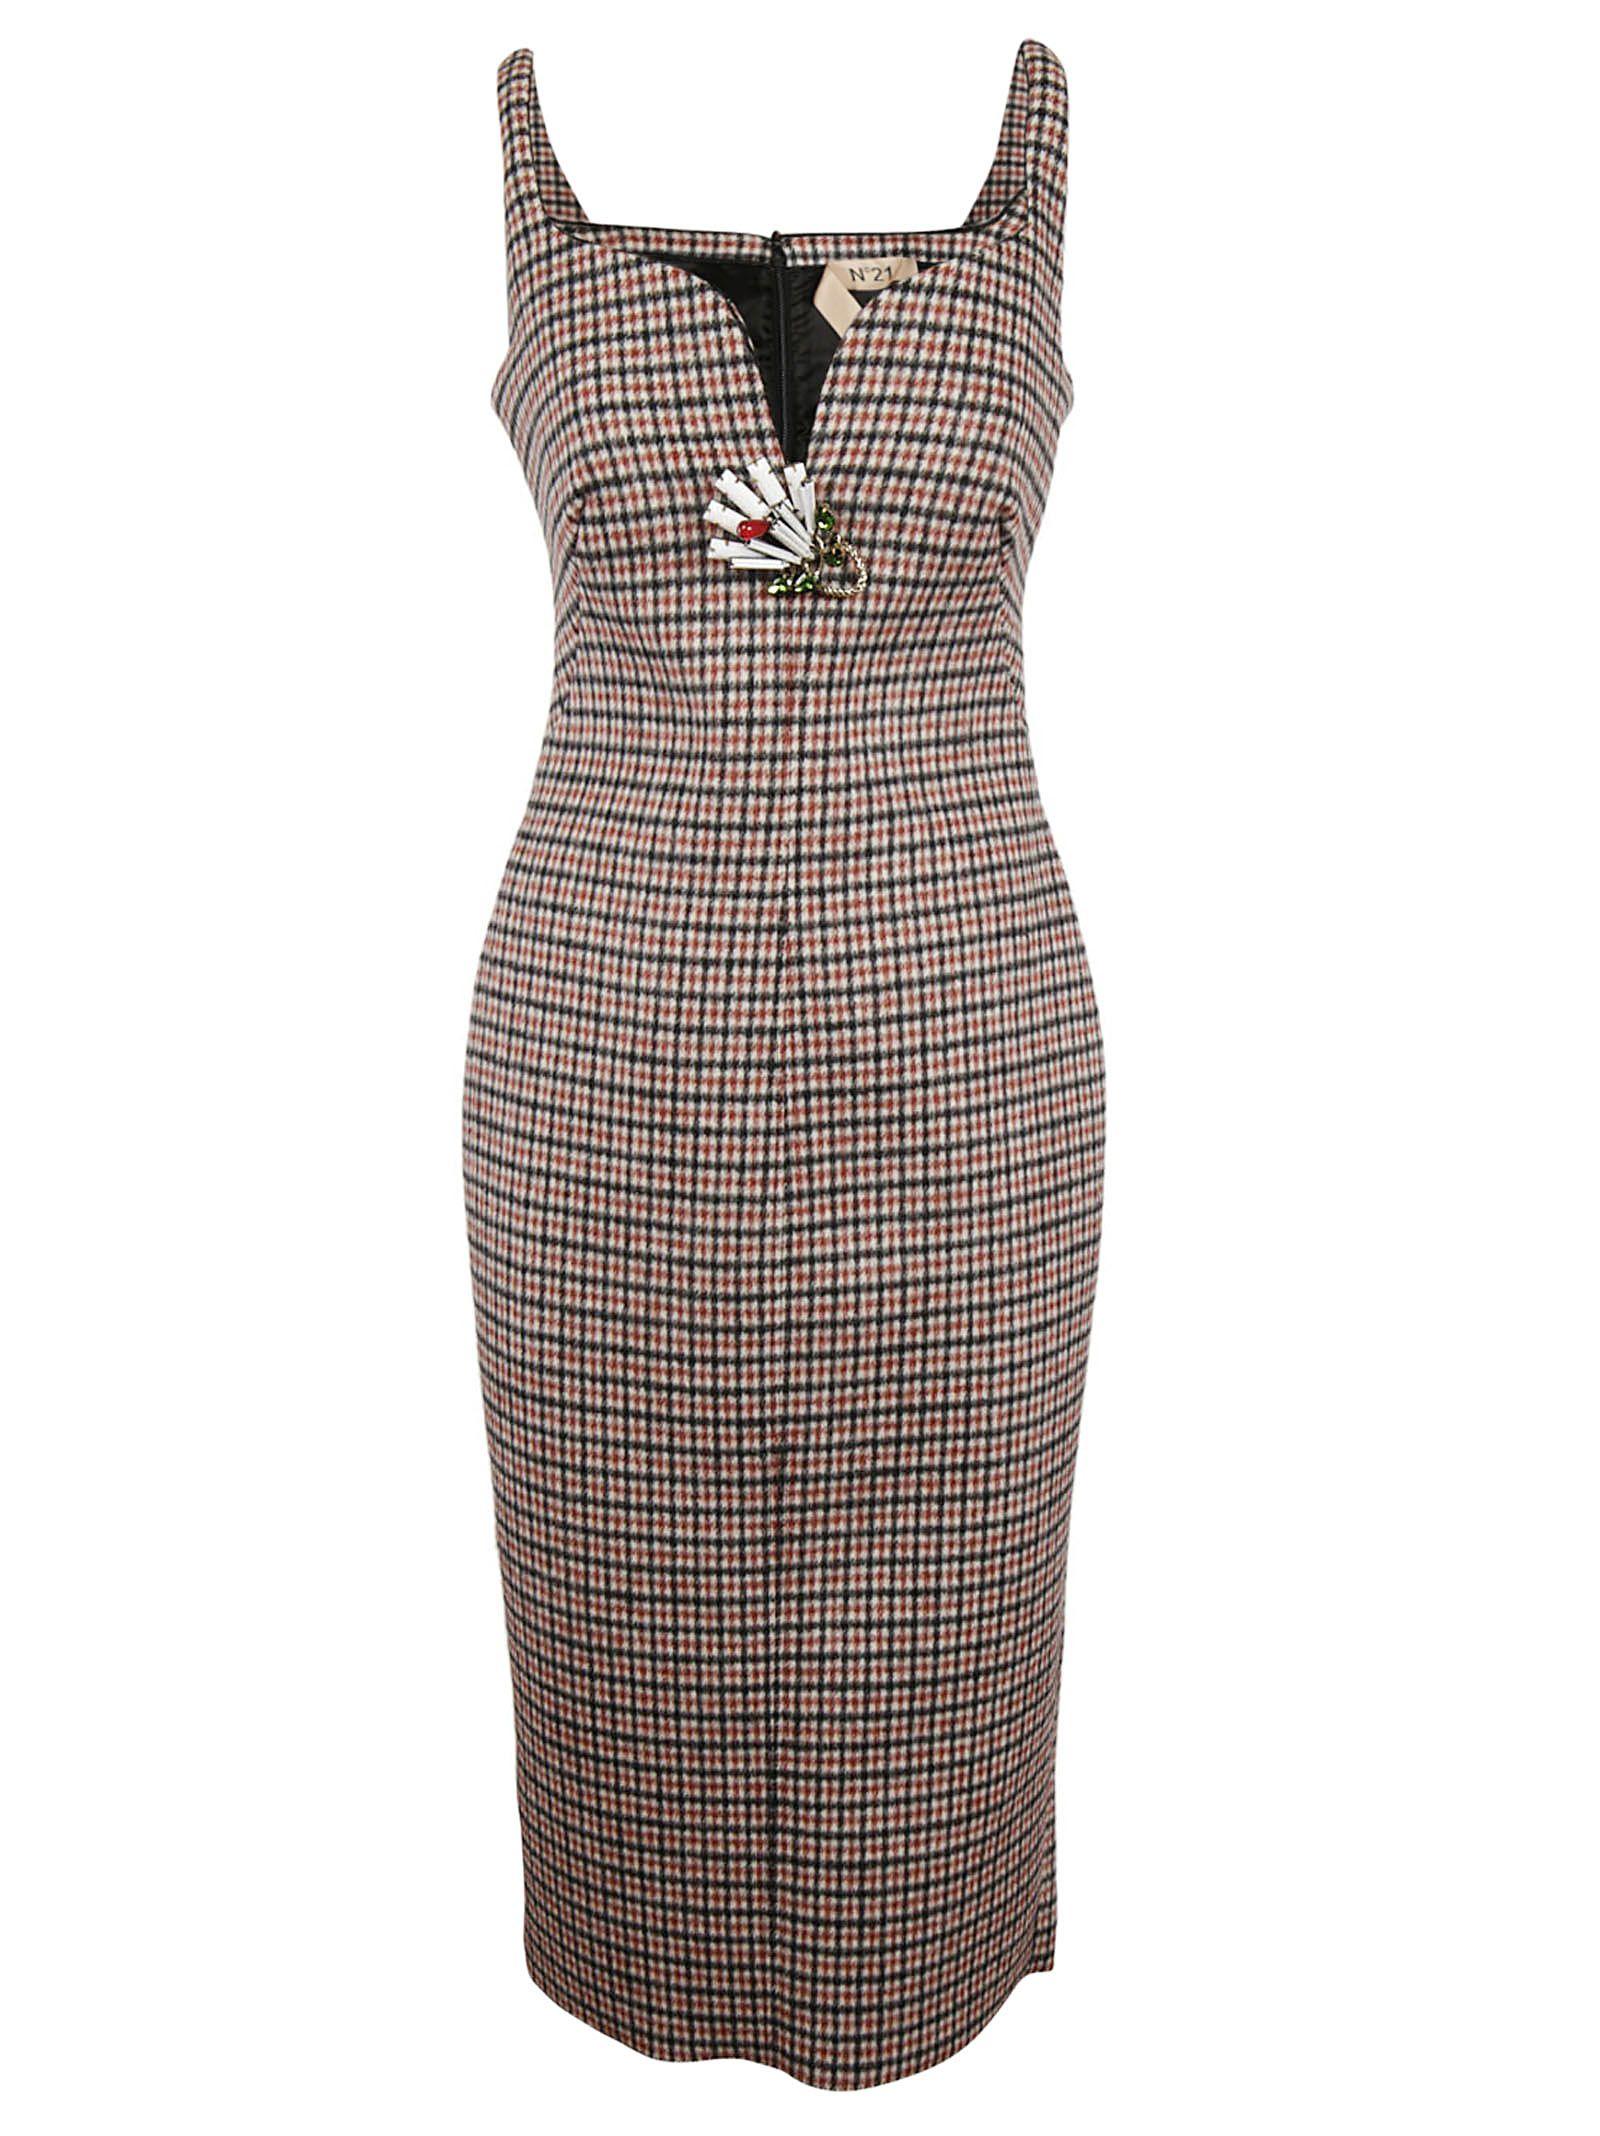 N.21 No21 Embellishment Dress